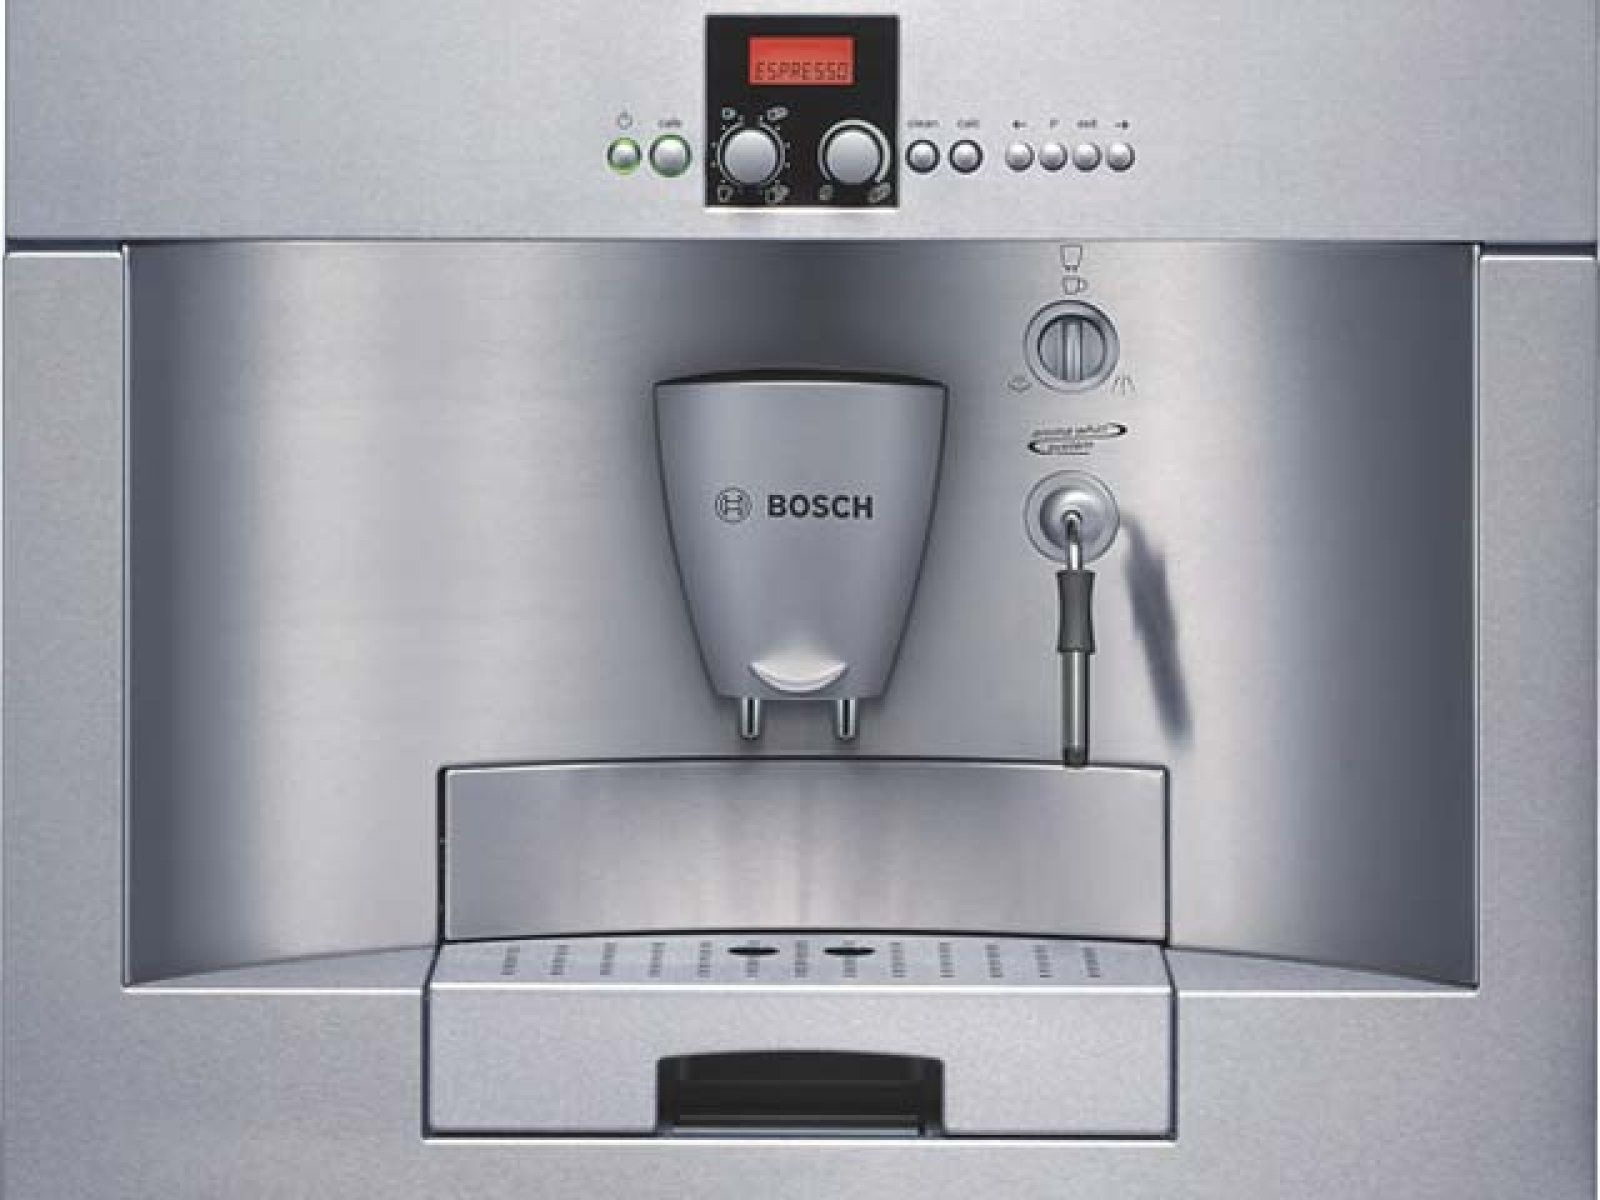 Cafeteras | Taza de café, Cafetera, Saliendo de casa